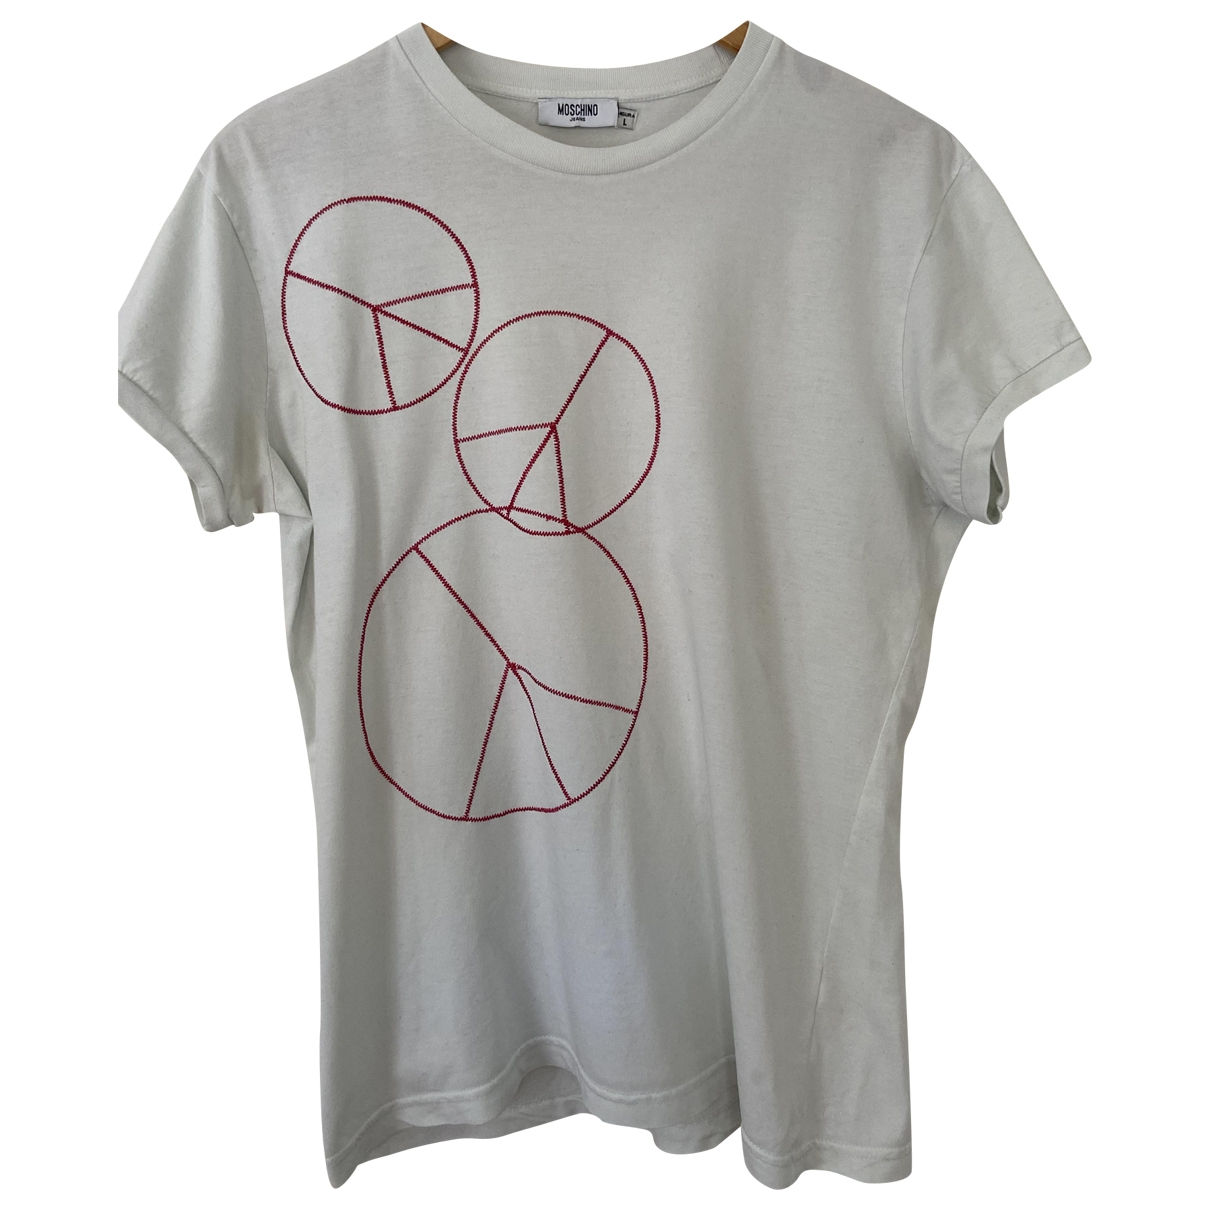 Moschino \N Ecru Cotton T-shirts for Men L International